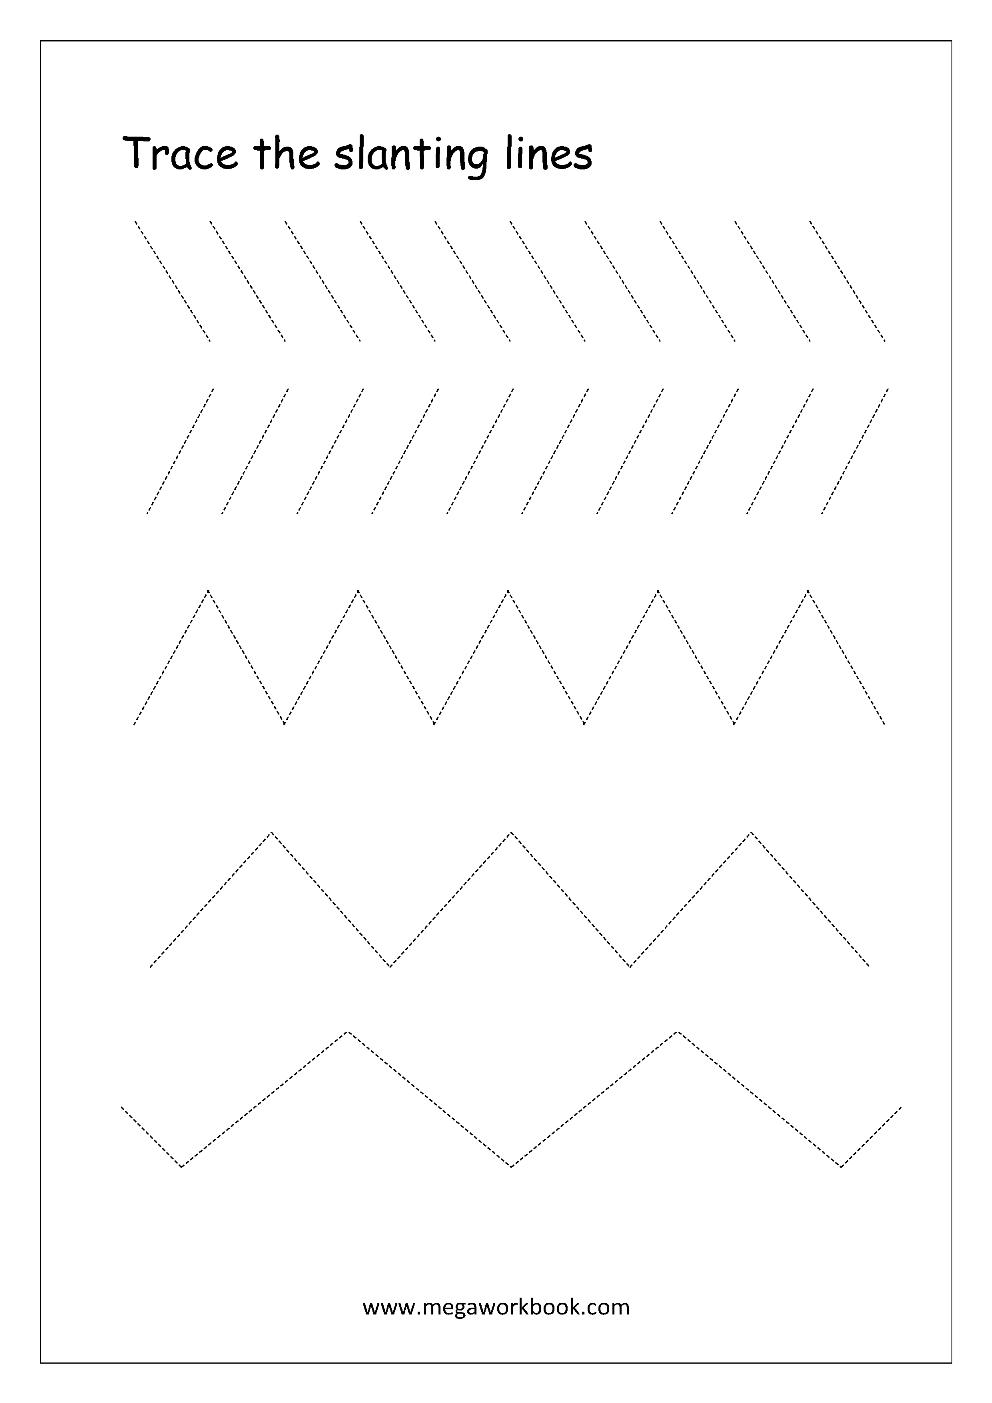 free printable pre writing tracing worksheets for. Black Bedroom Furniture Sets. Home Design Ideas